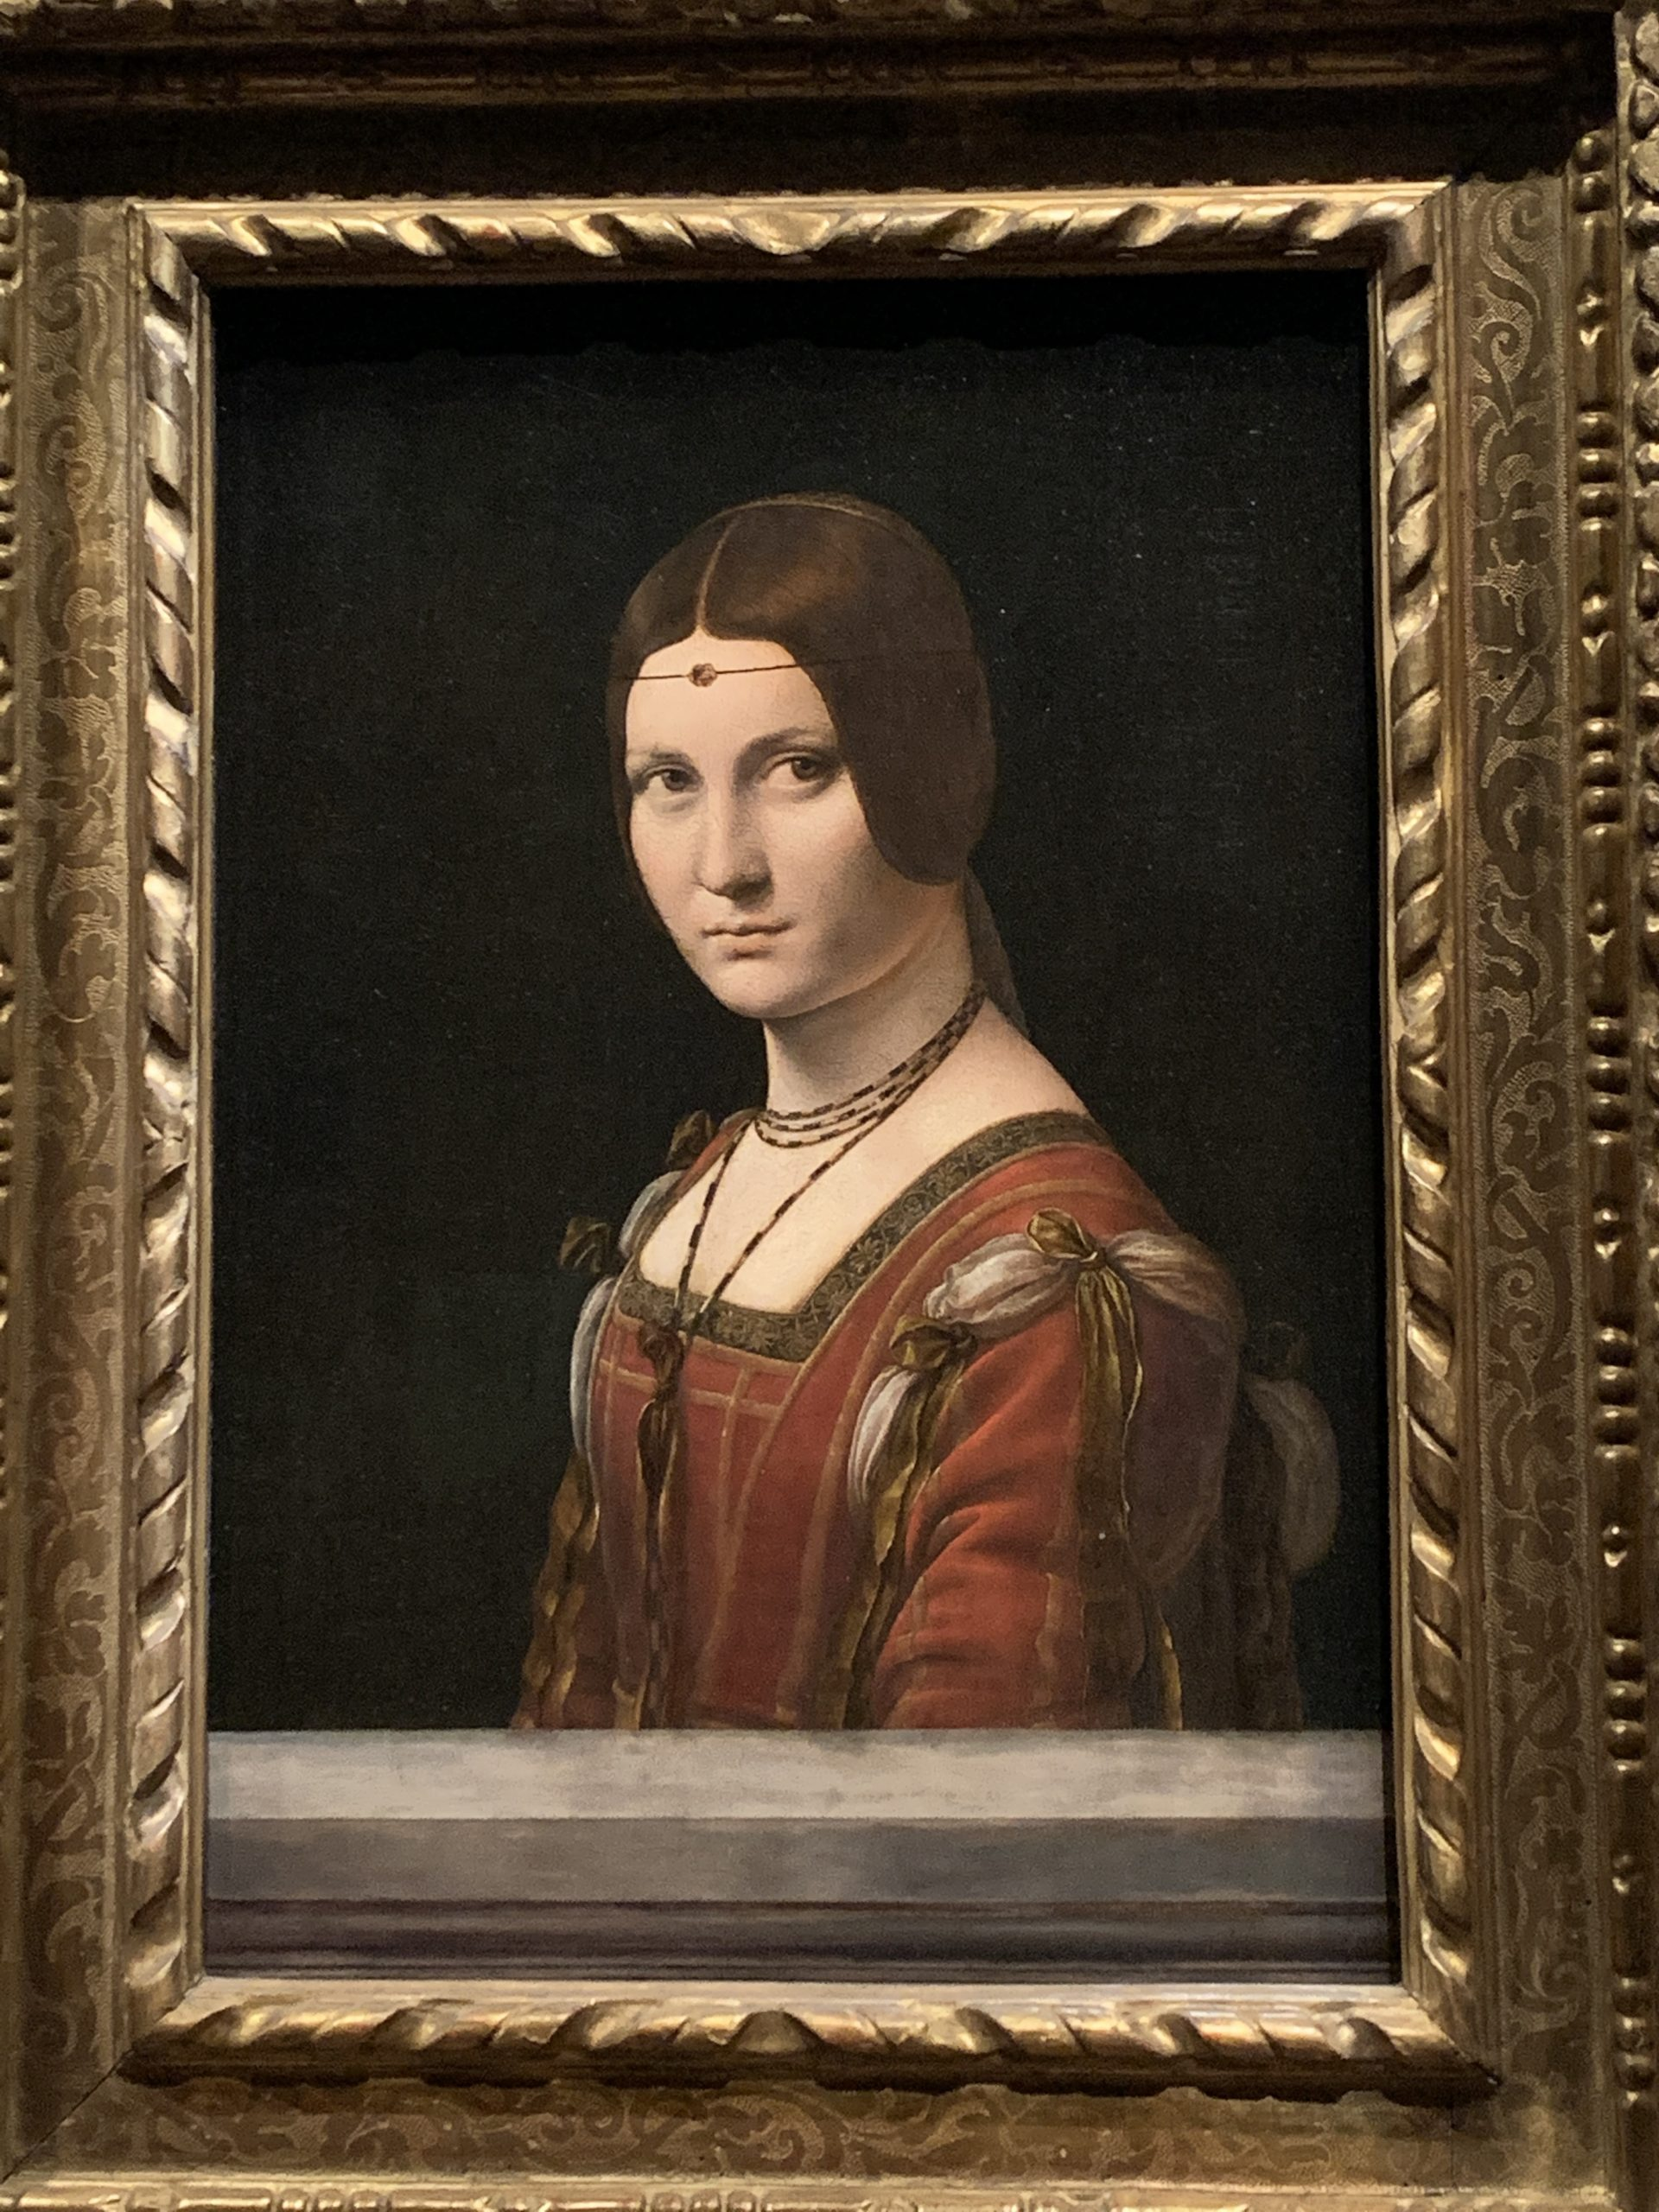 Exposition Léonard de Vinci au Louvre – Sakarton